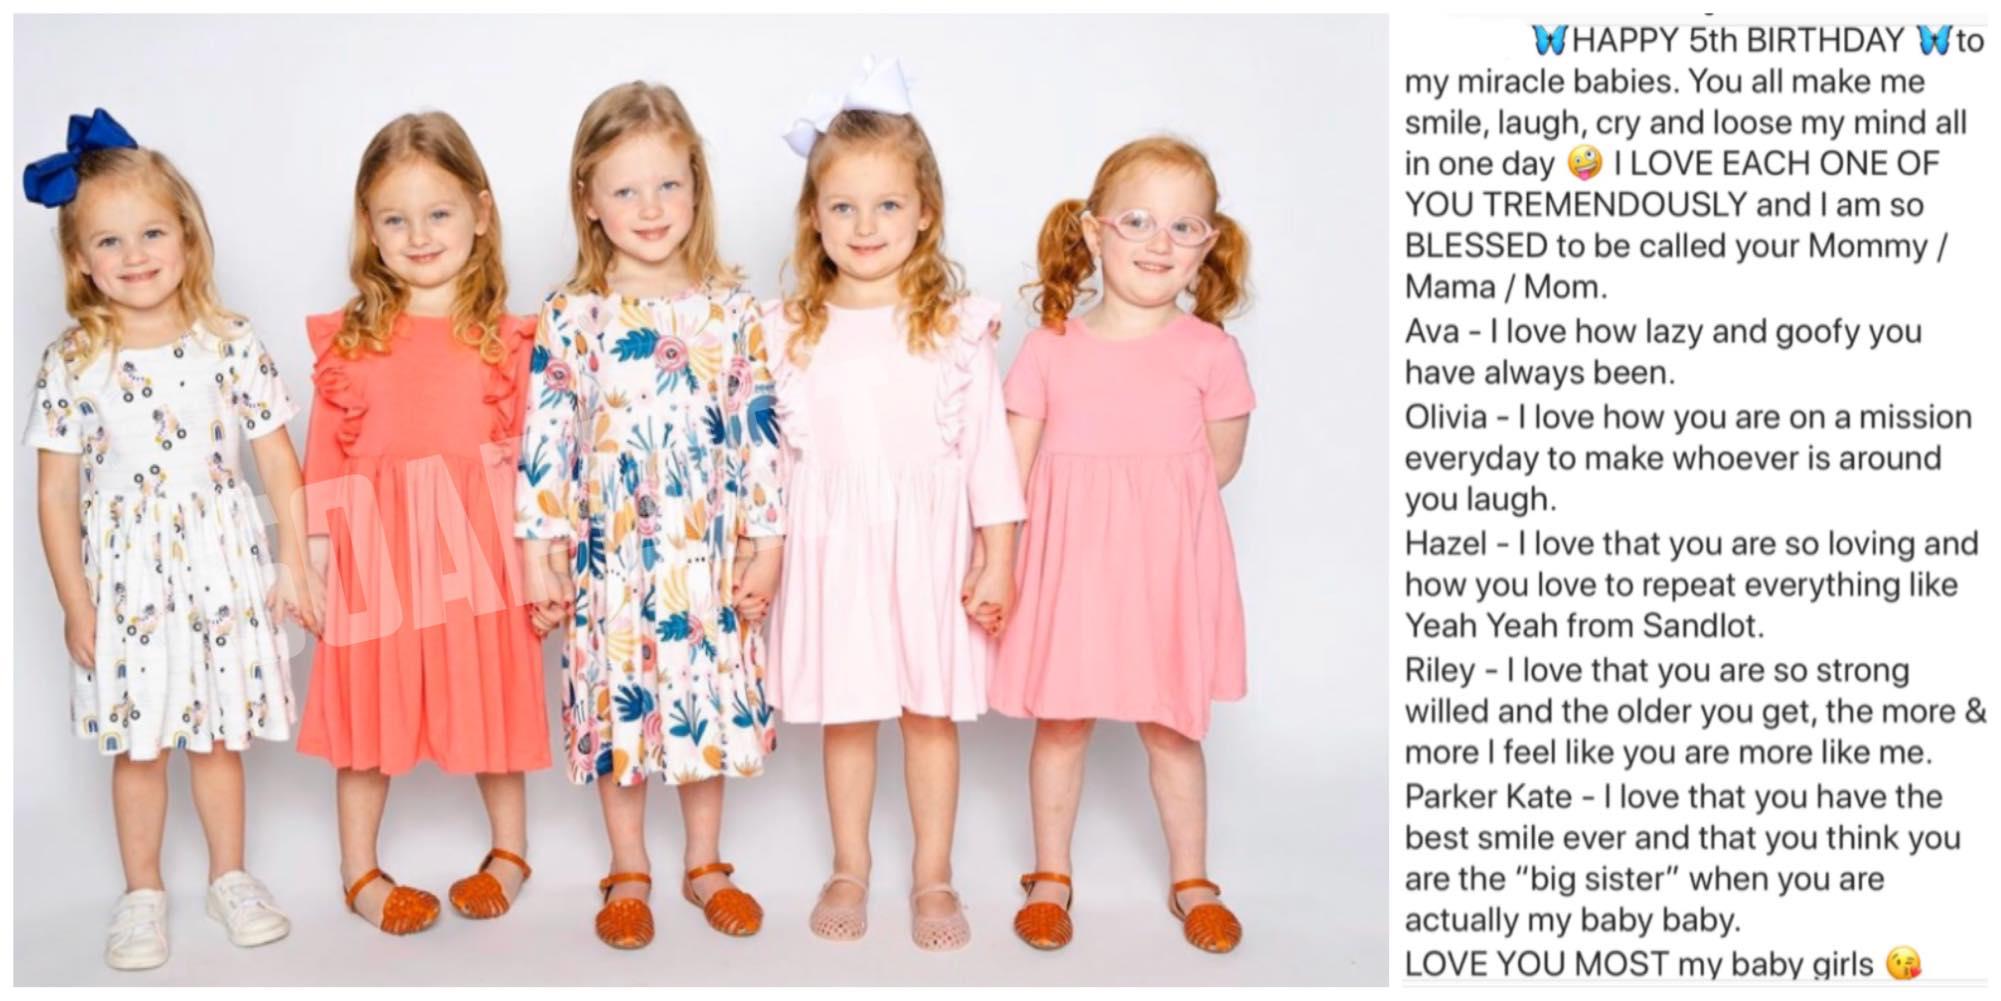 OutDaughtered: Riley Busby - Ava - Parker - Olivia - Hazel